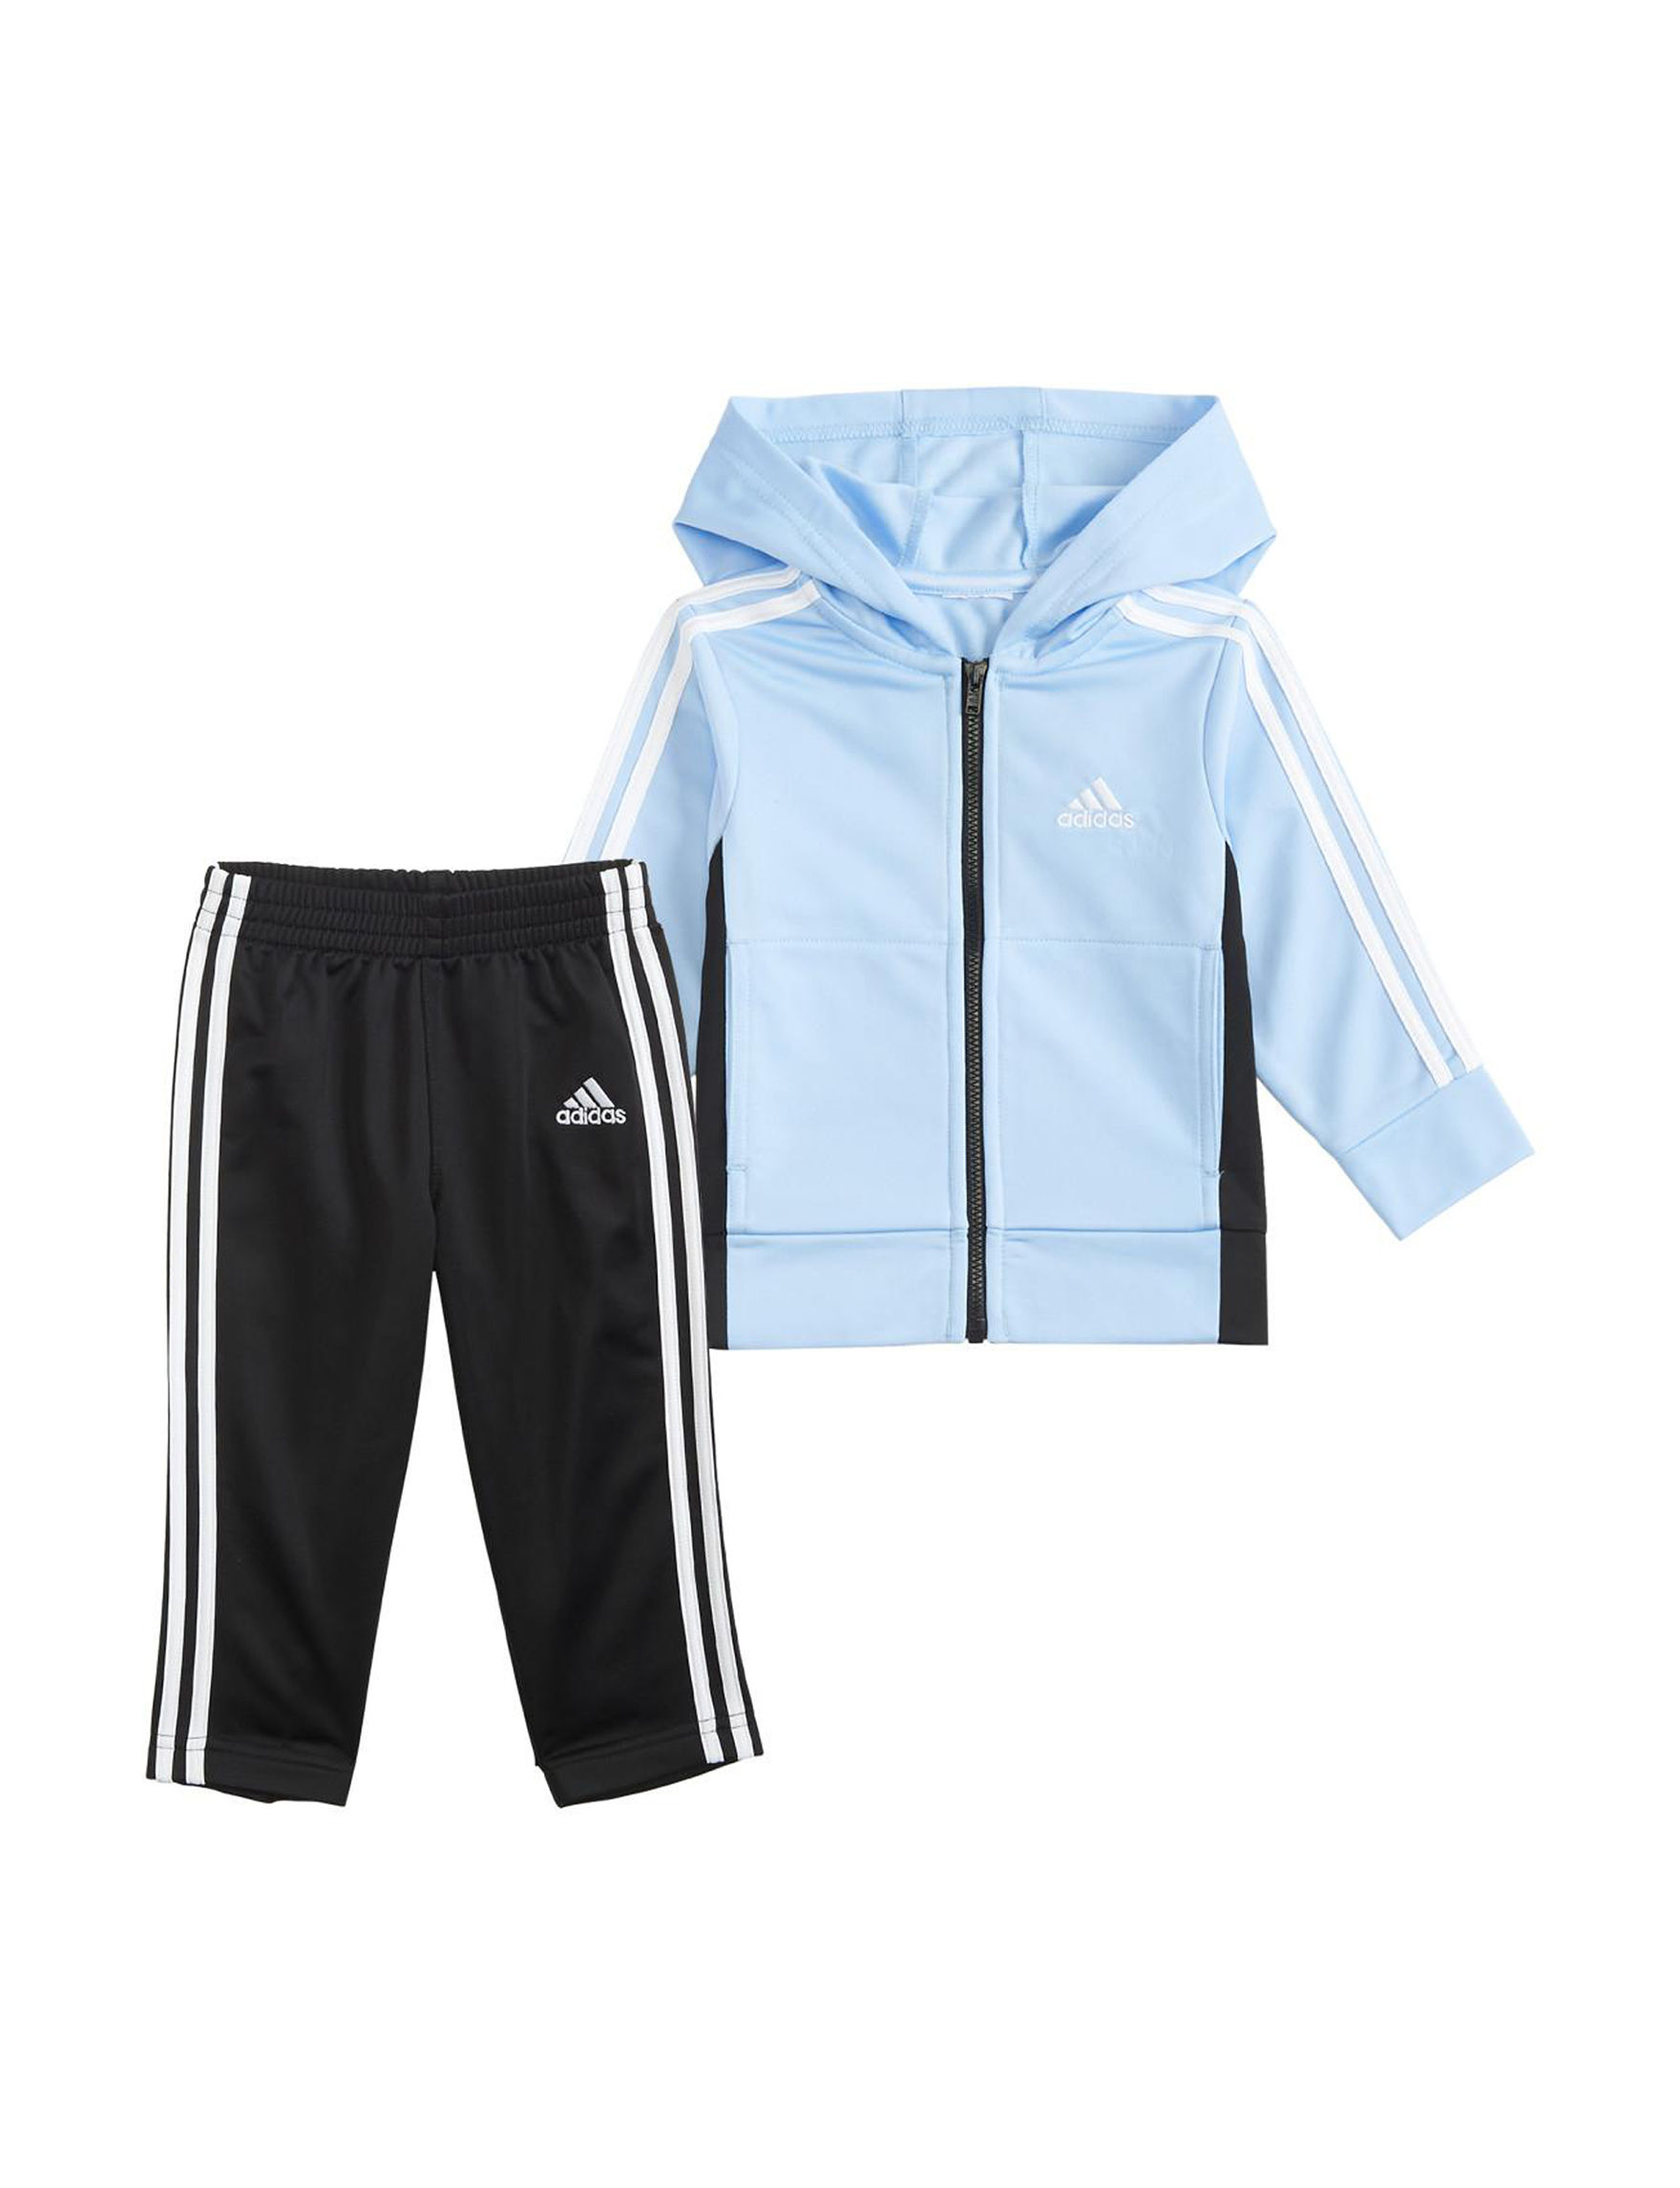 Adidas Light Blue / Black